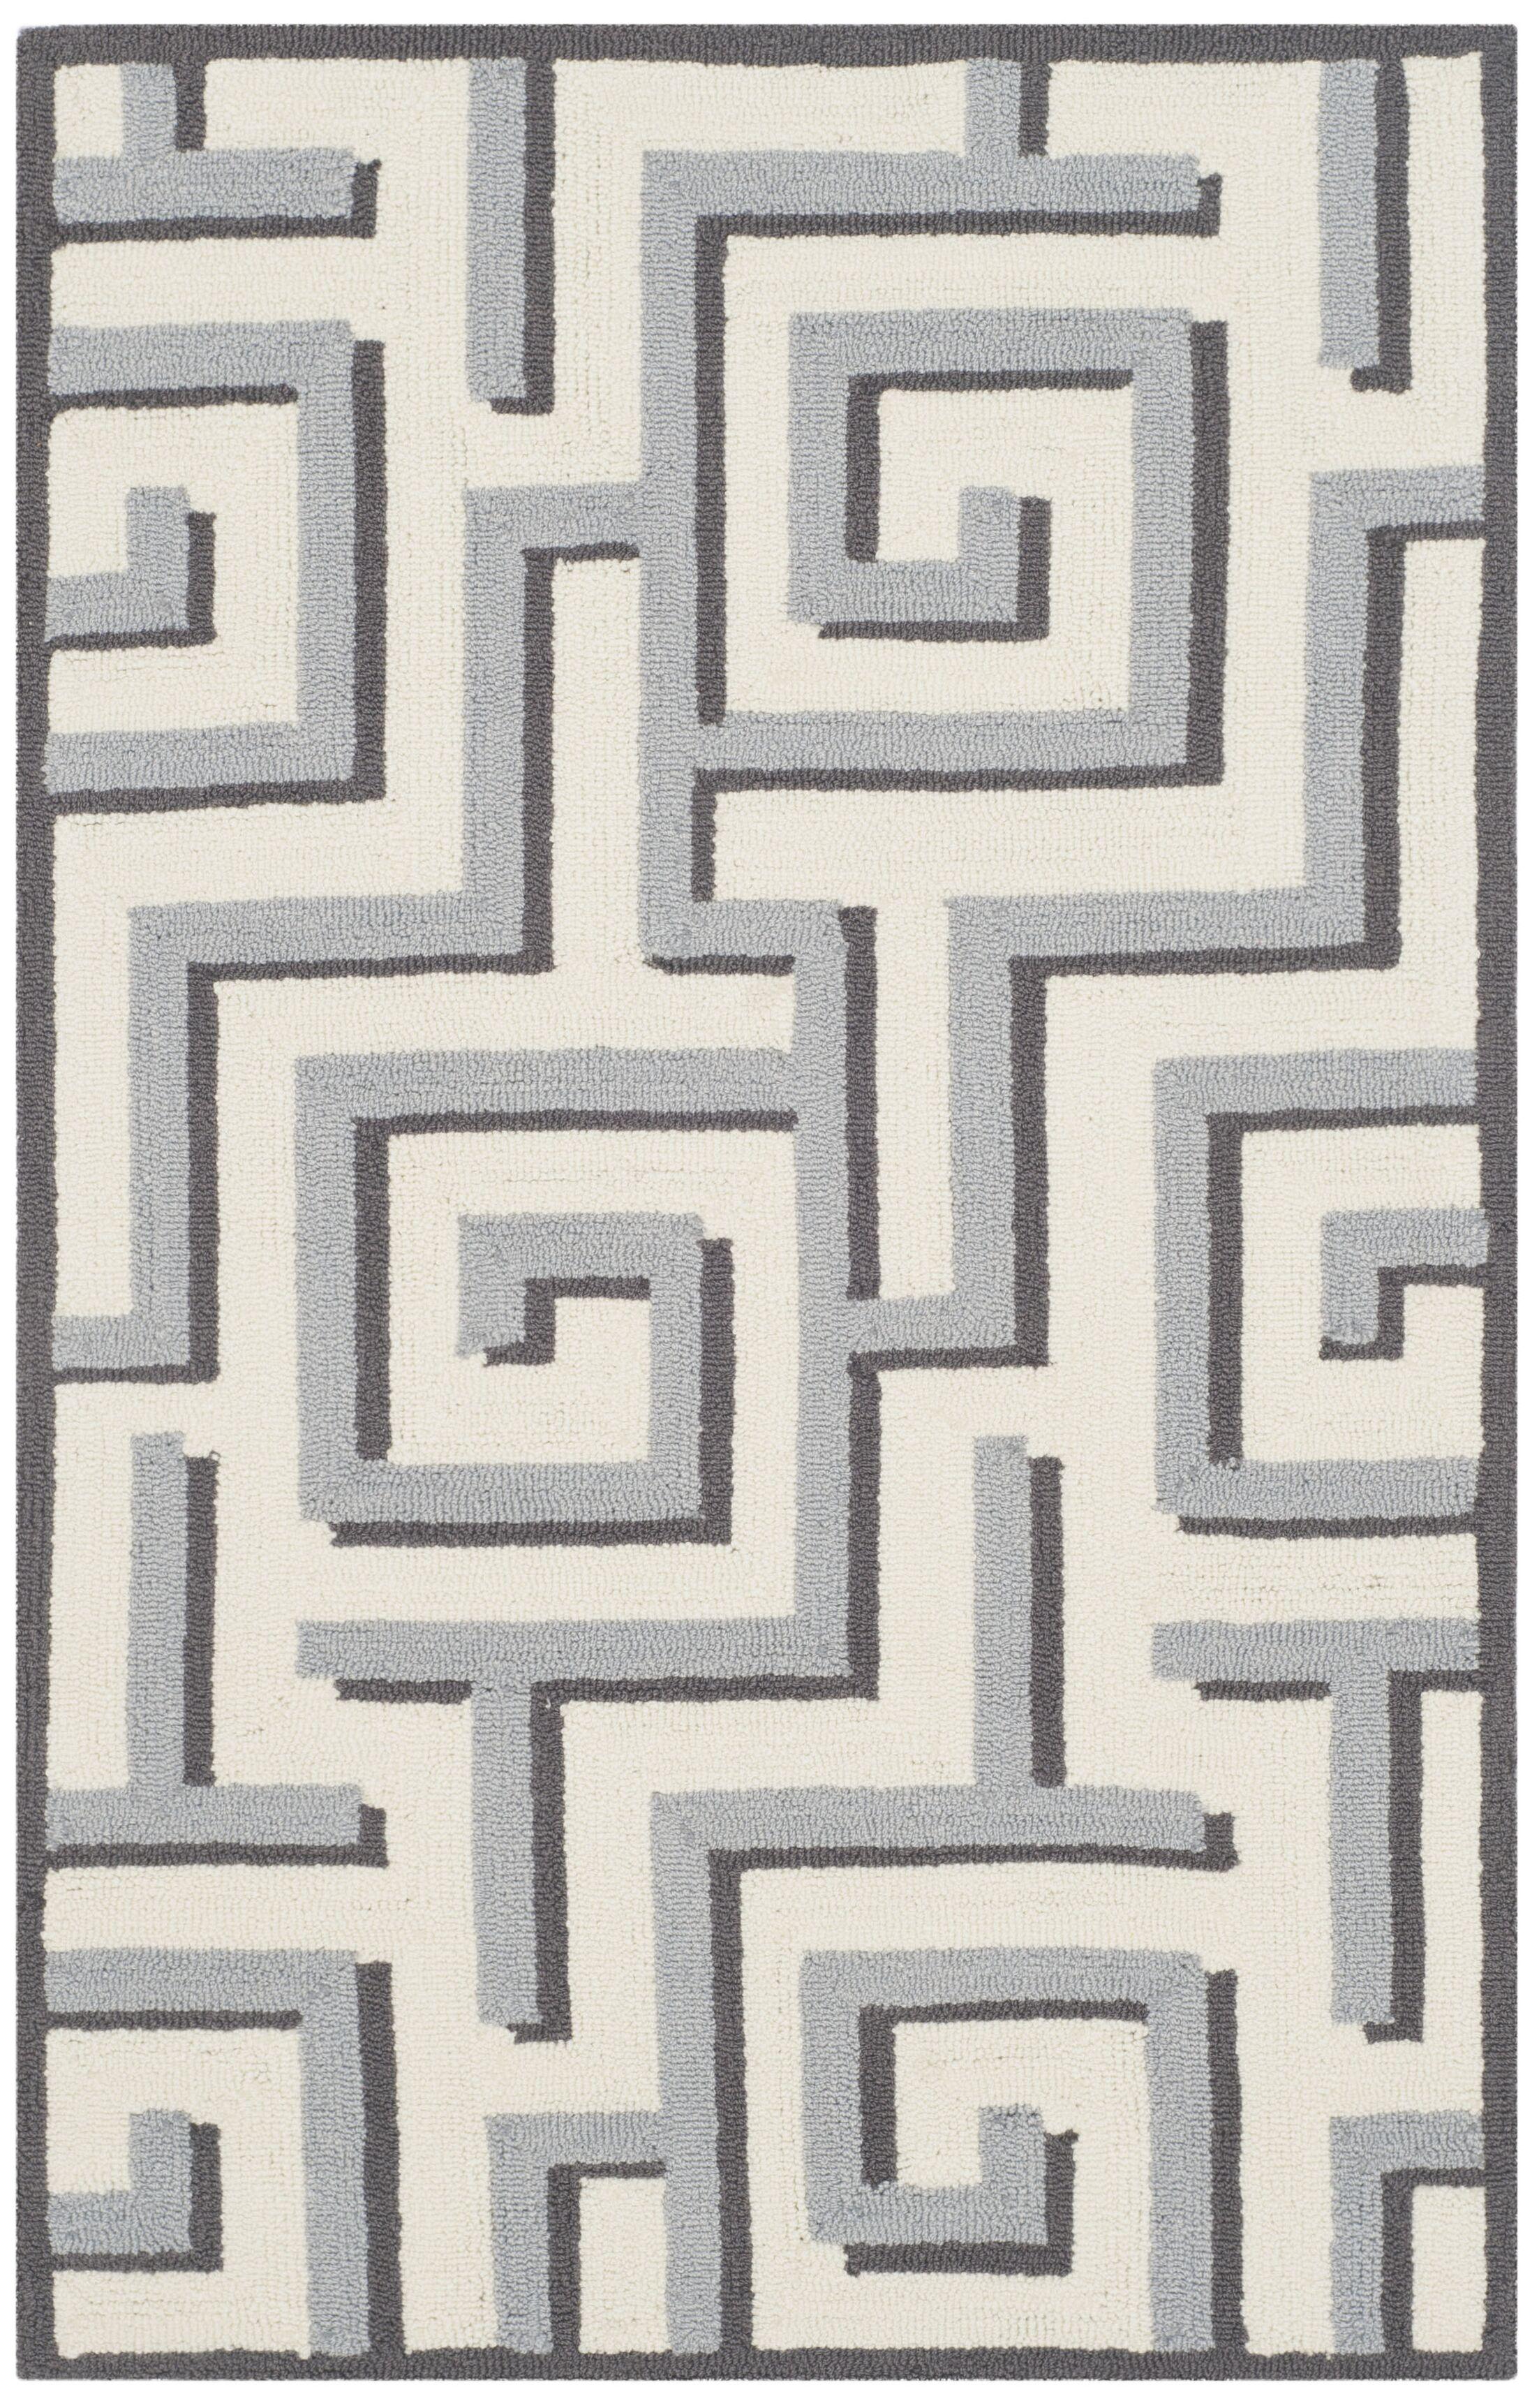 Naya Ivory/Gray Indoor/Outdoor Area Rug Rug Size: Rectangle 8' x 10'